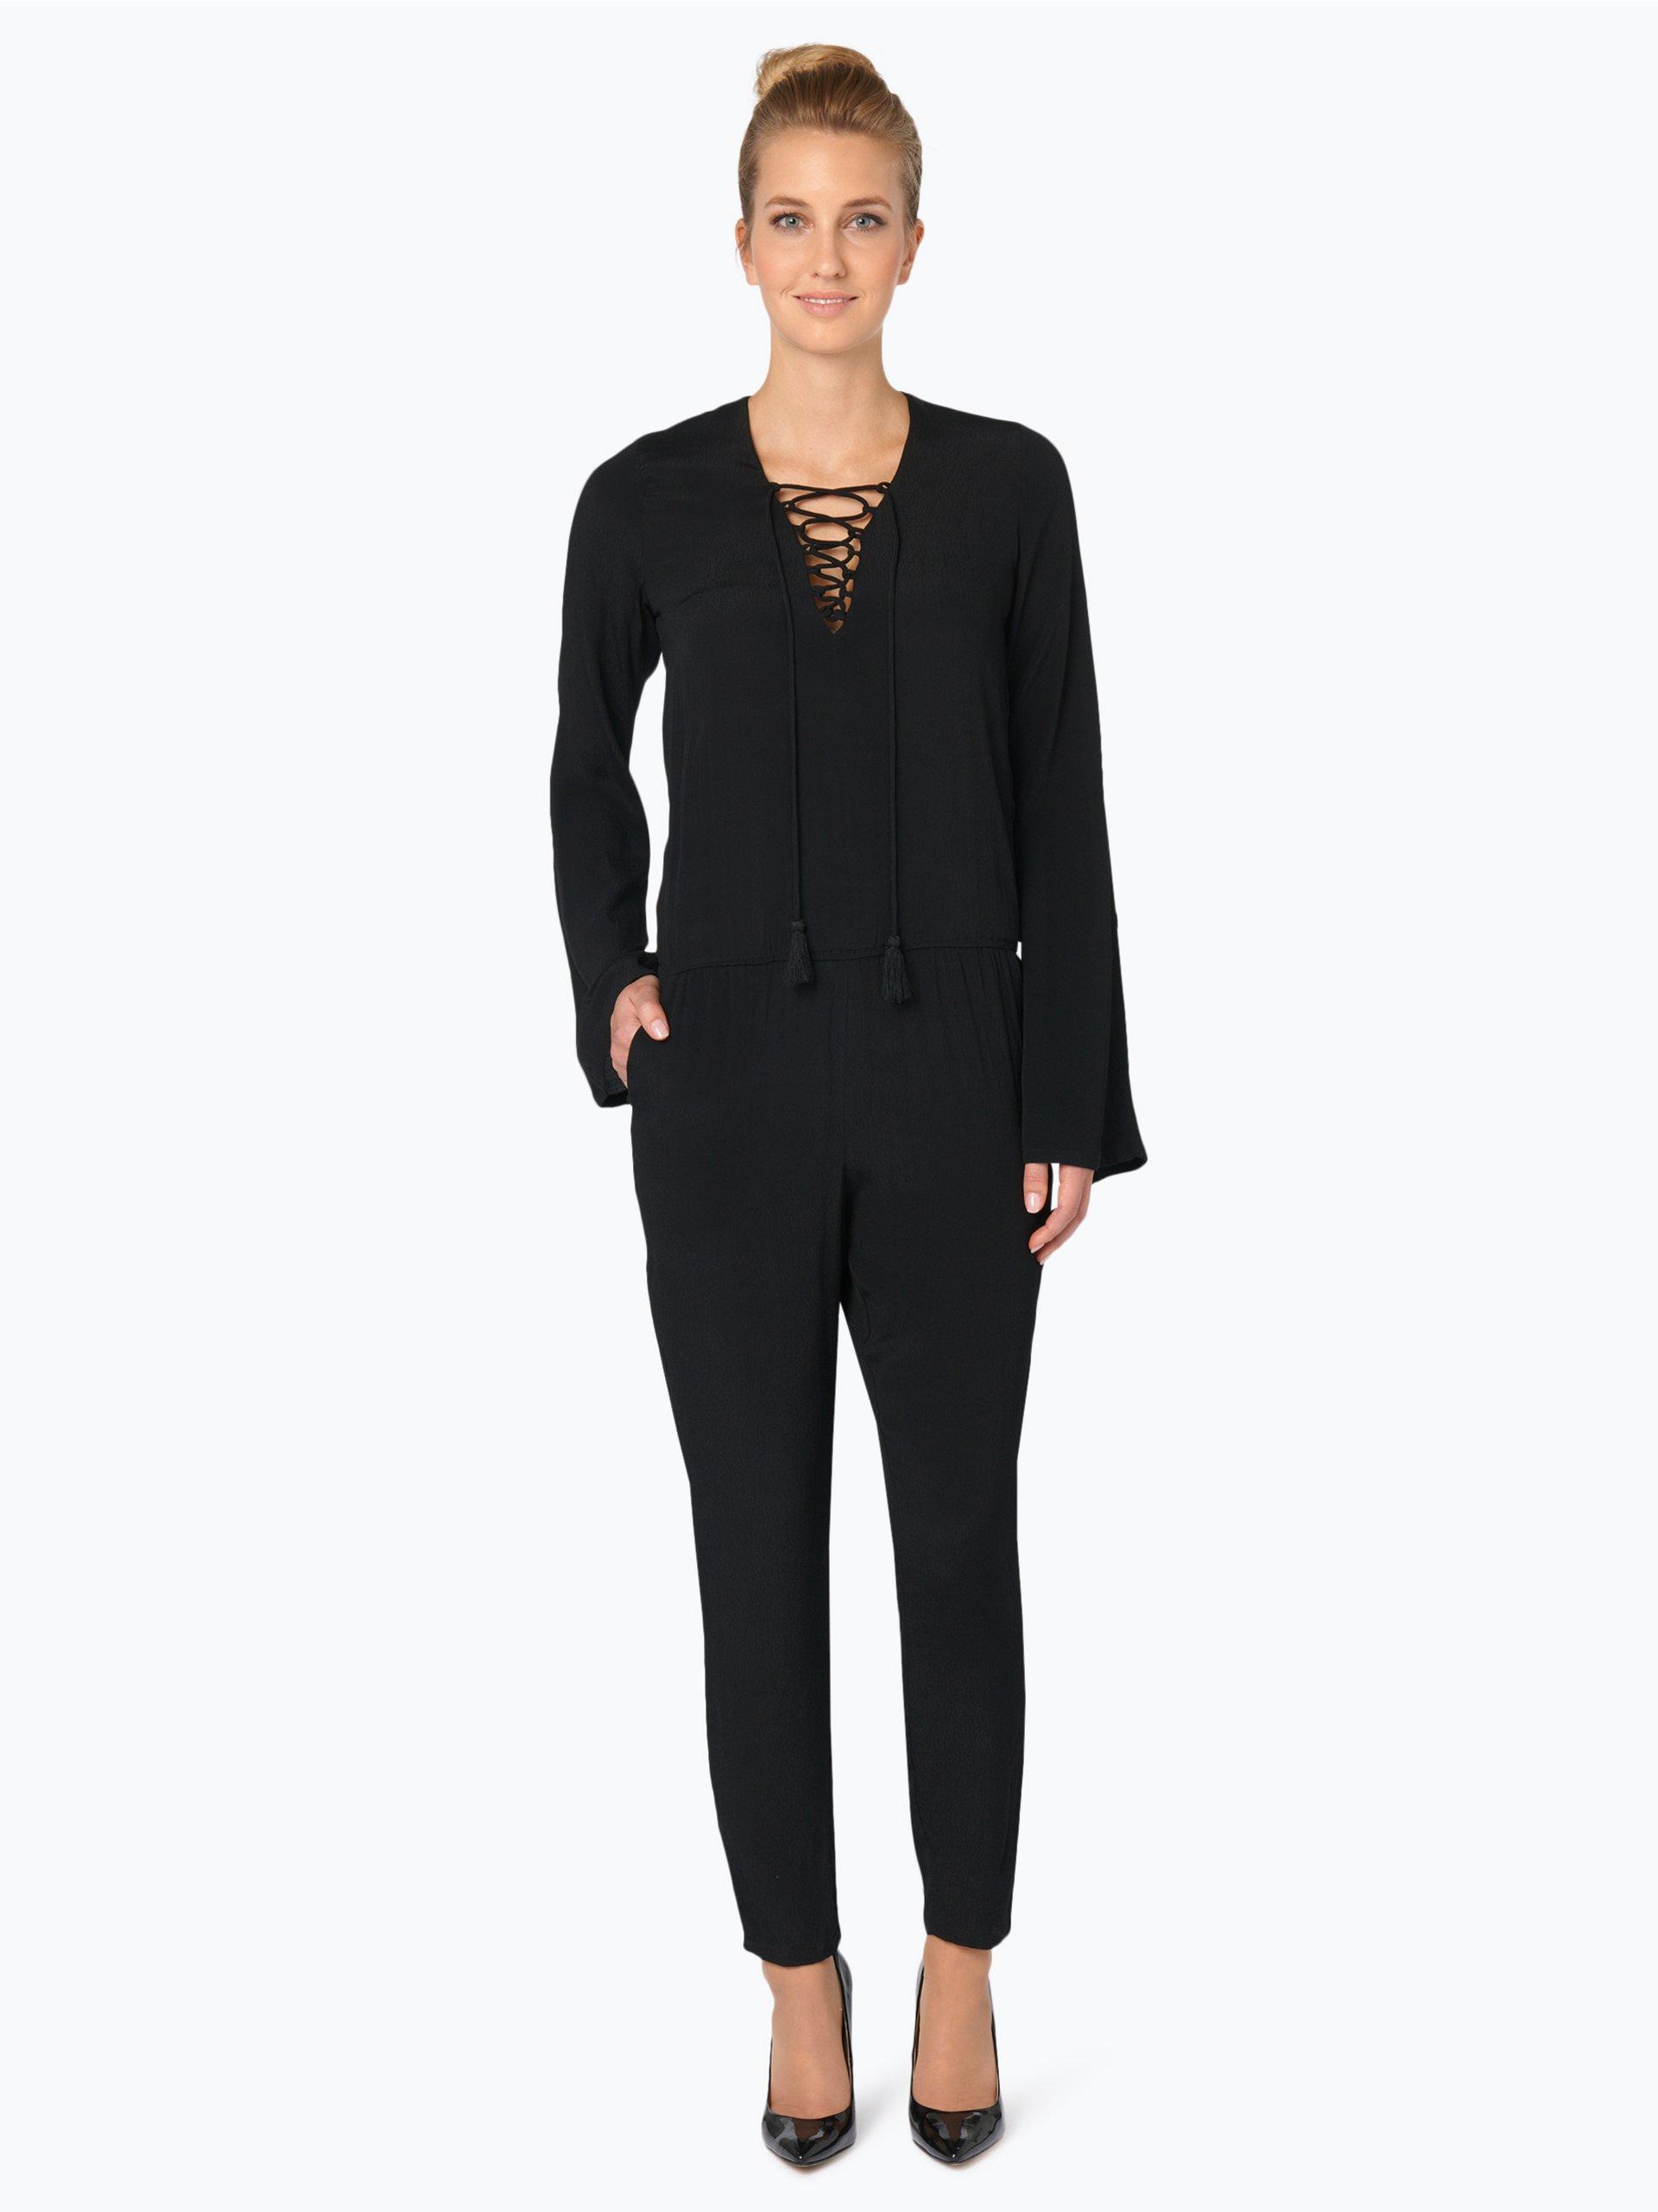 review damen jumpsuit schwarz wei uni online kaufen. Black Bedroom Furniture Sets. Home Design Ideas